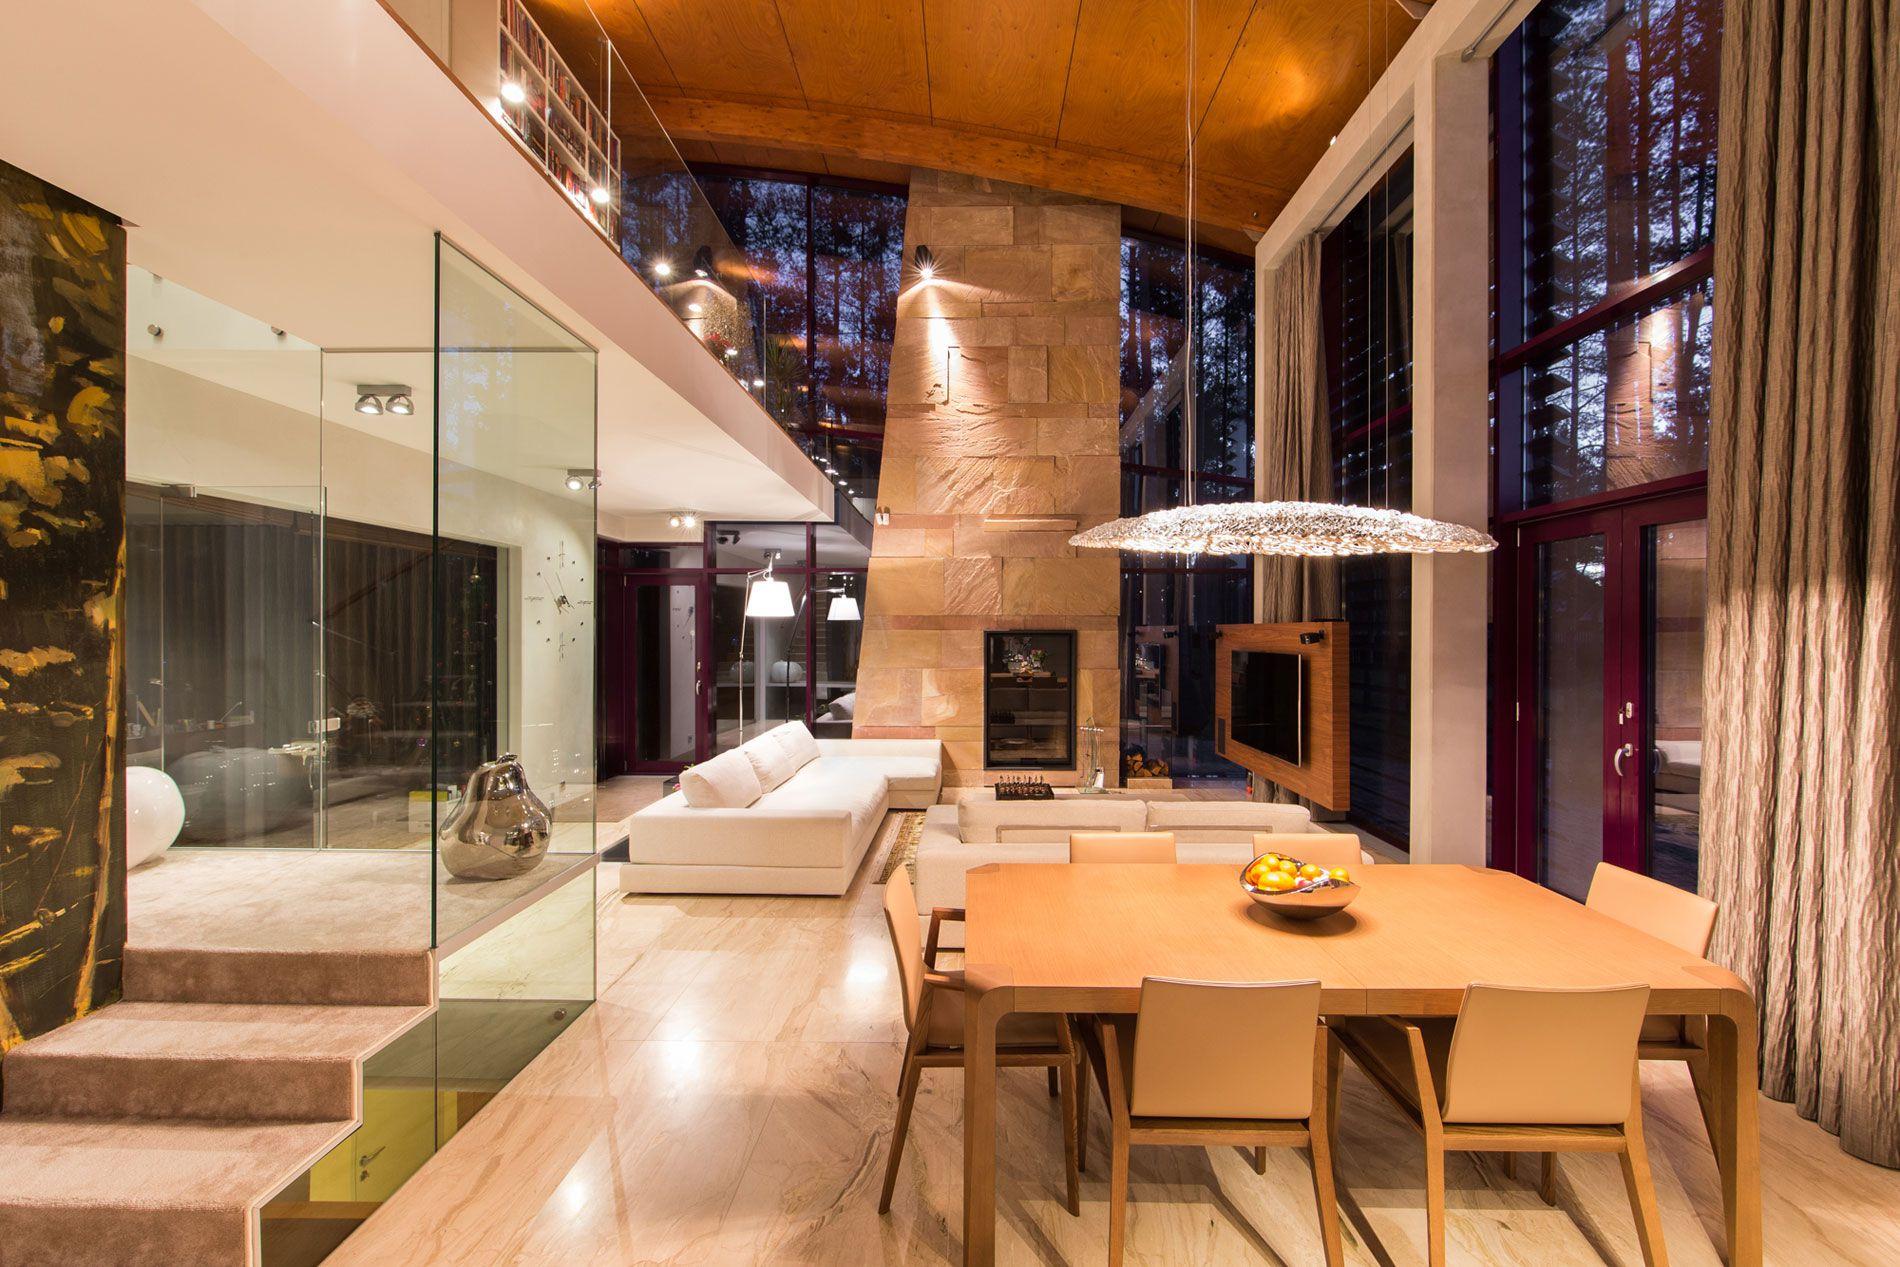 Ultramodern Villa Estebania Near the Forrest by Arch-D-12